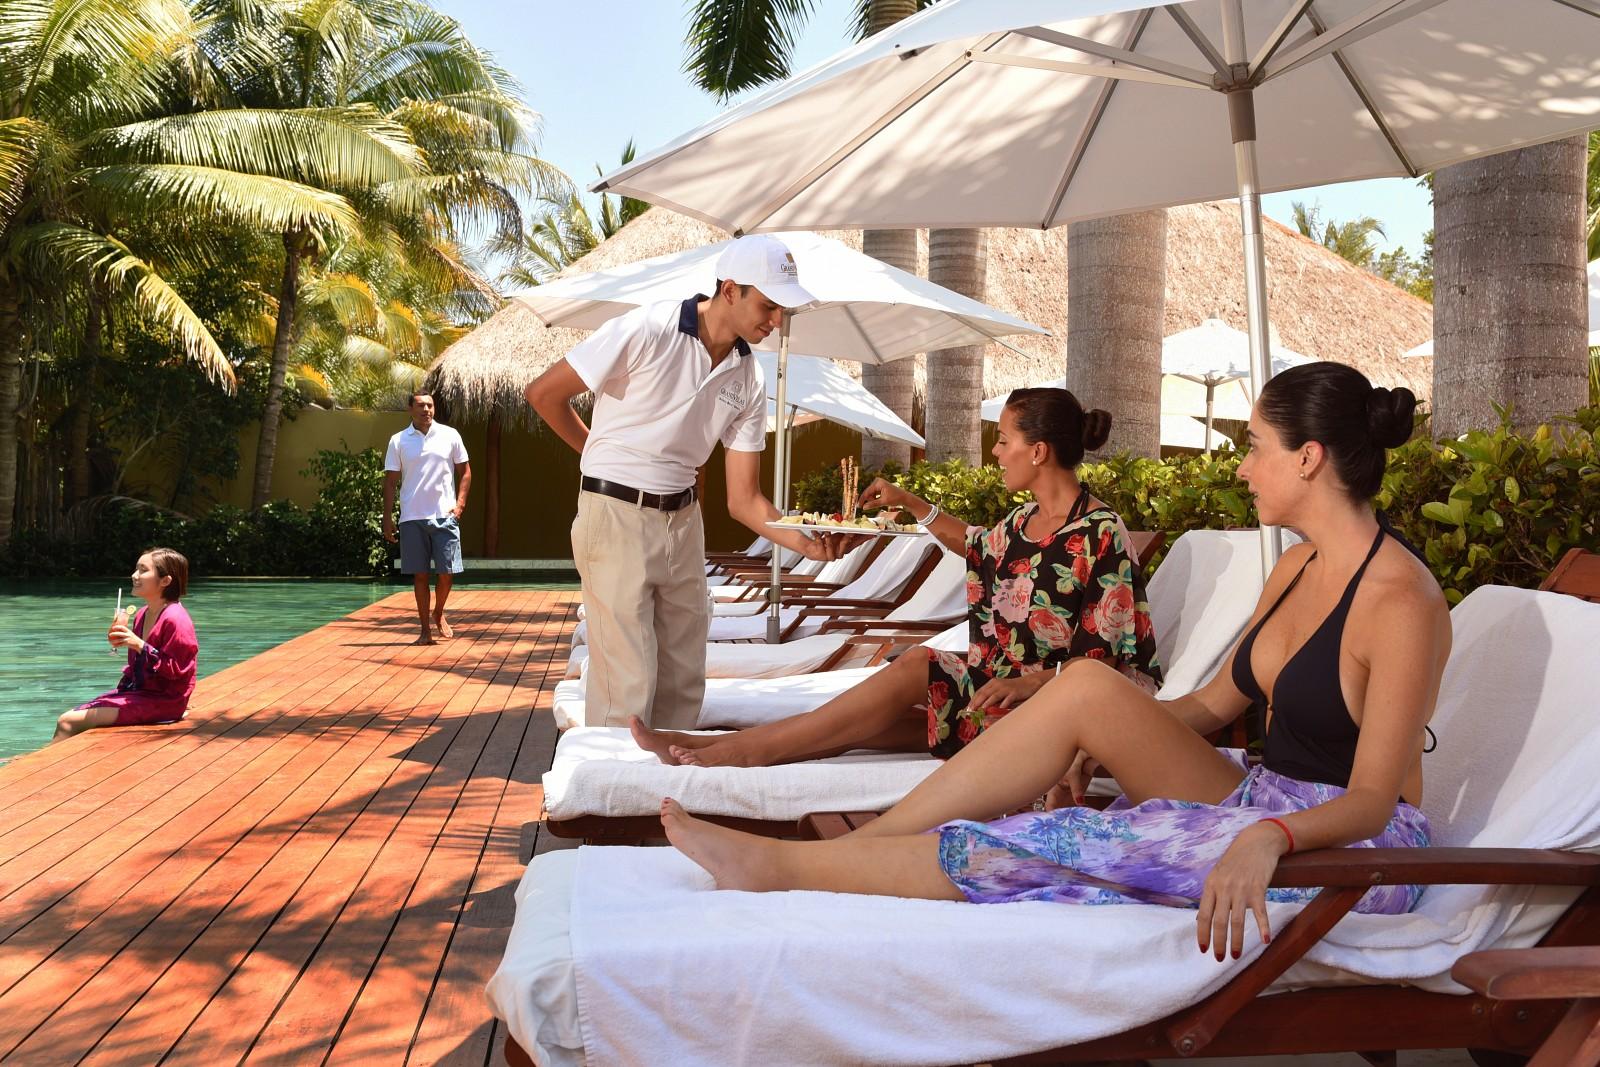 Travel Agency All-Inclusive Resort Grand Velas Riviera Maya 022